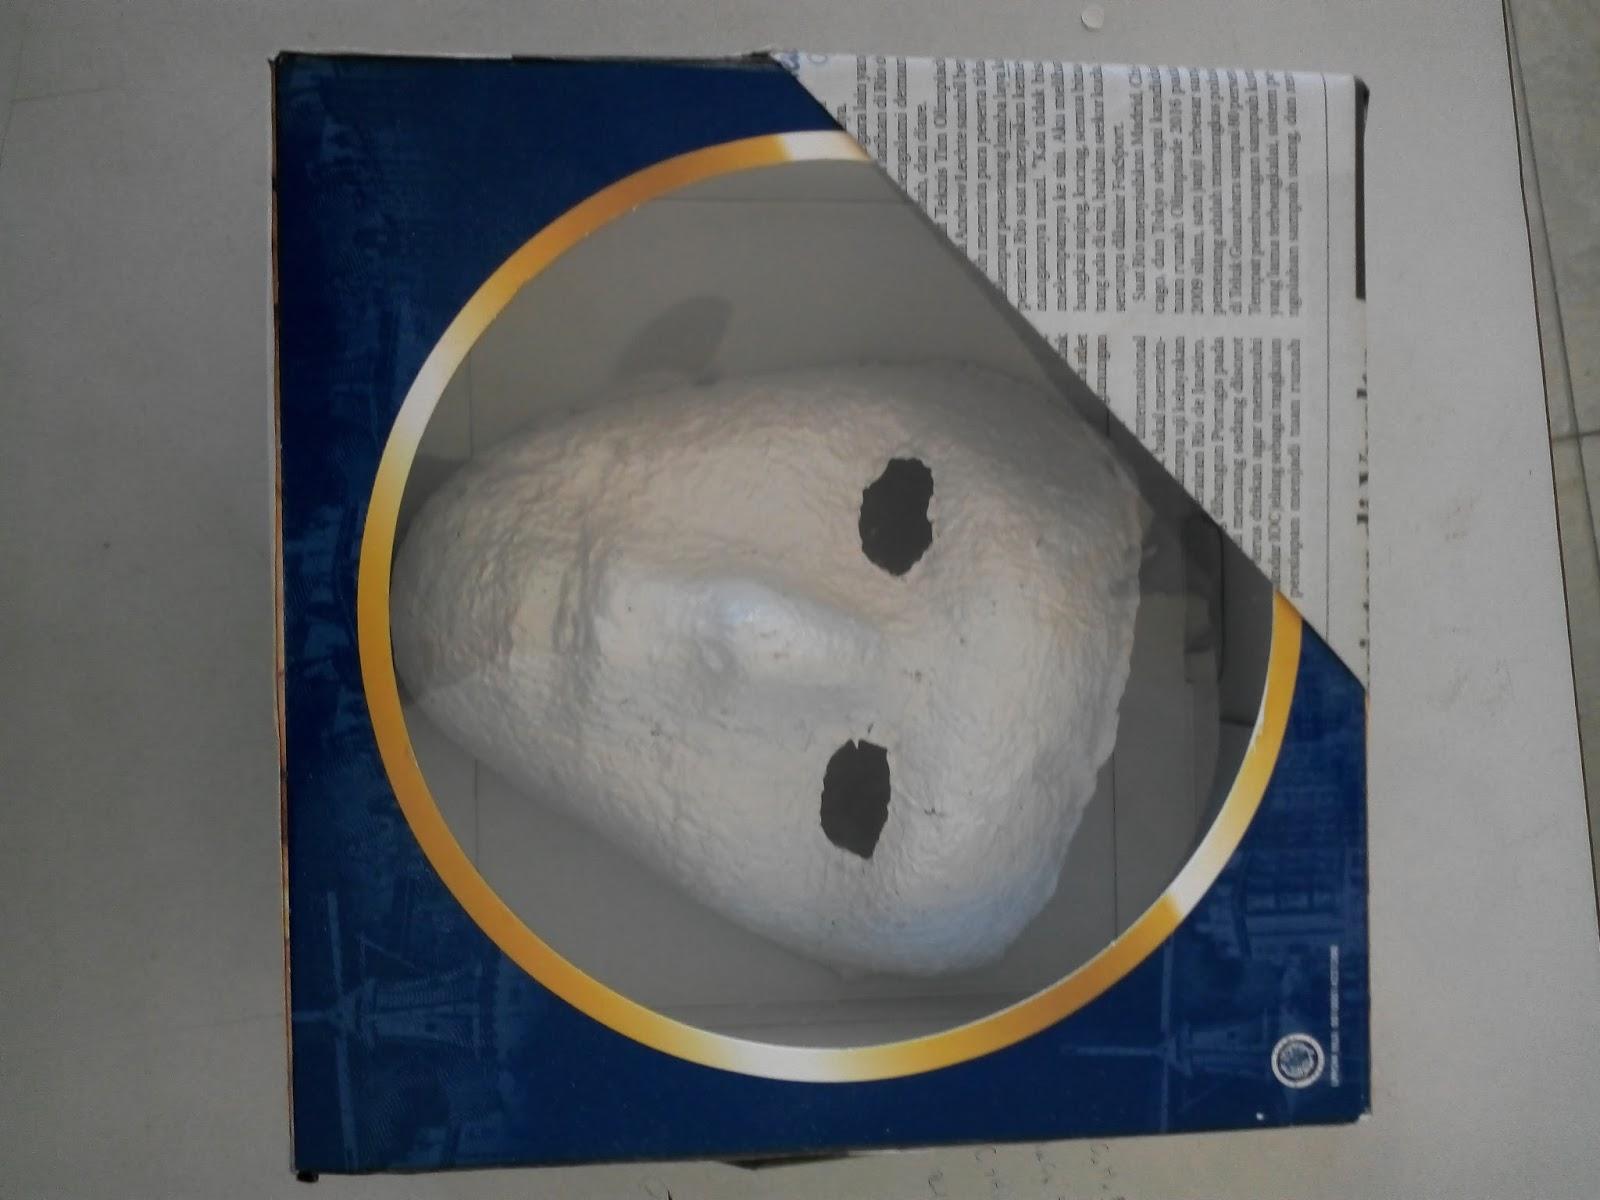 Kerajinan dari bubur kertas   Prakarya XI-MIA 8 SMAN 1 Tuban